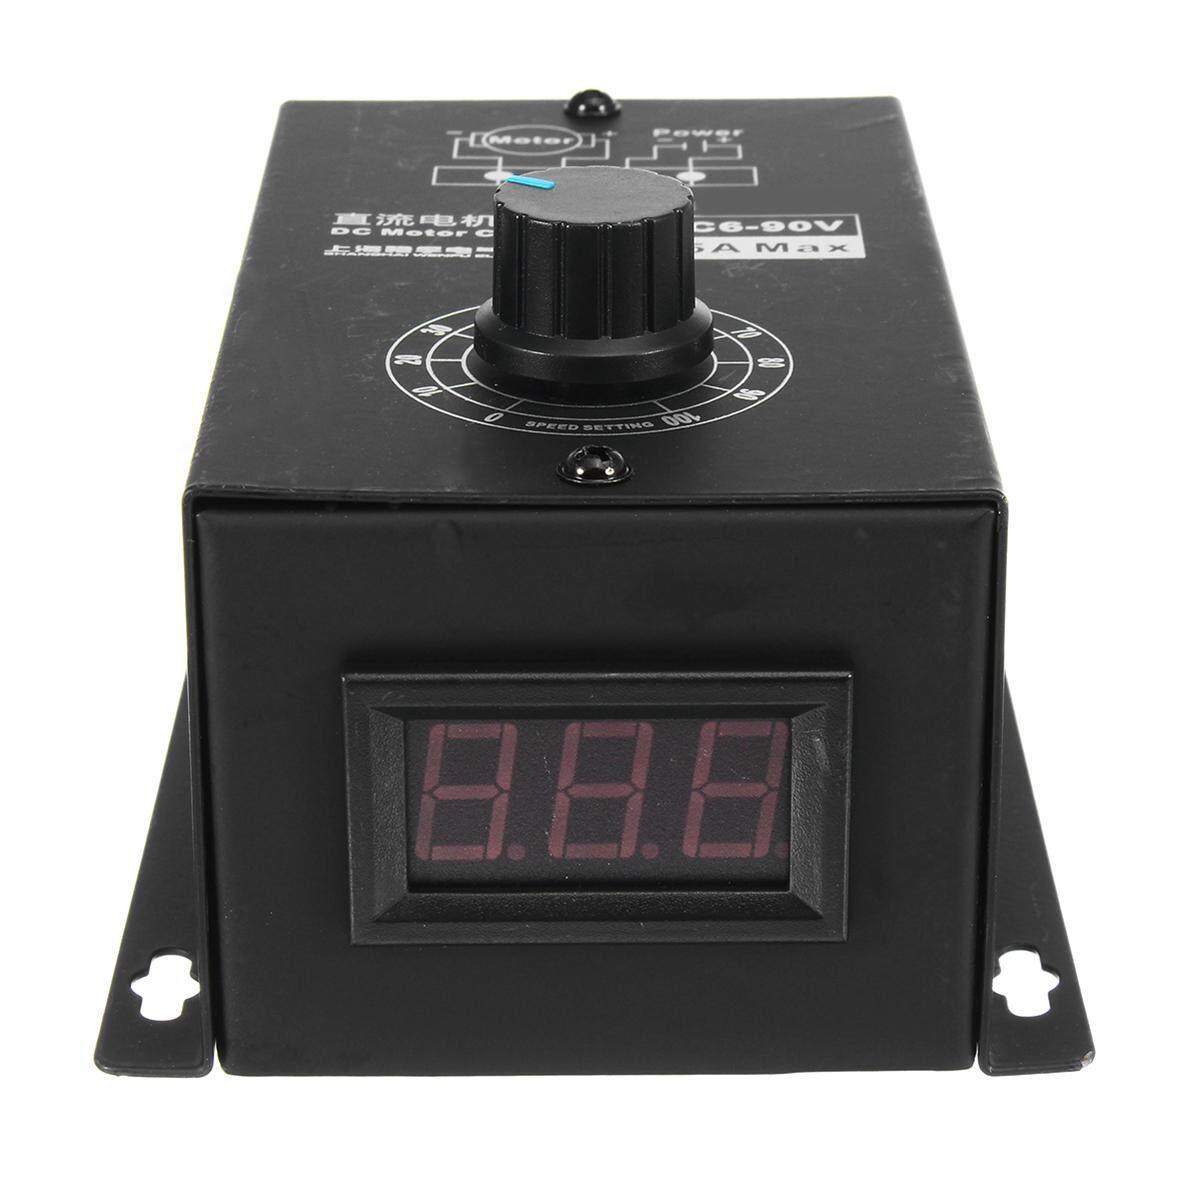 6 V-90 V 15A Kecepatan Motor DC Regulator PWM Modul Pengendali Switch W/